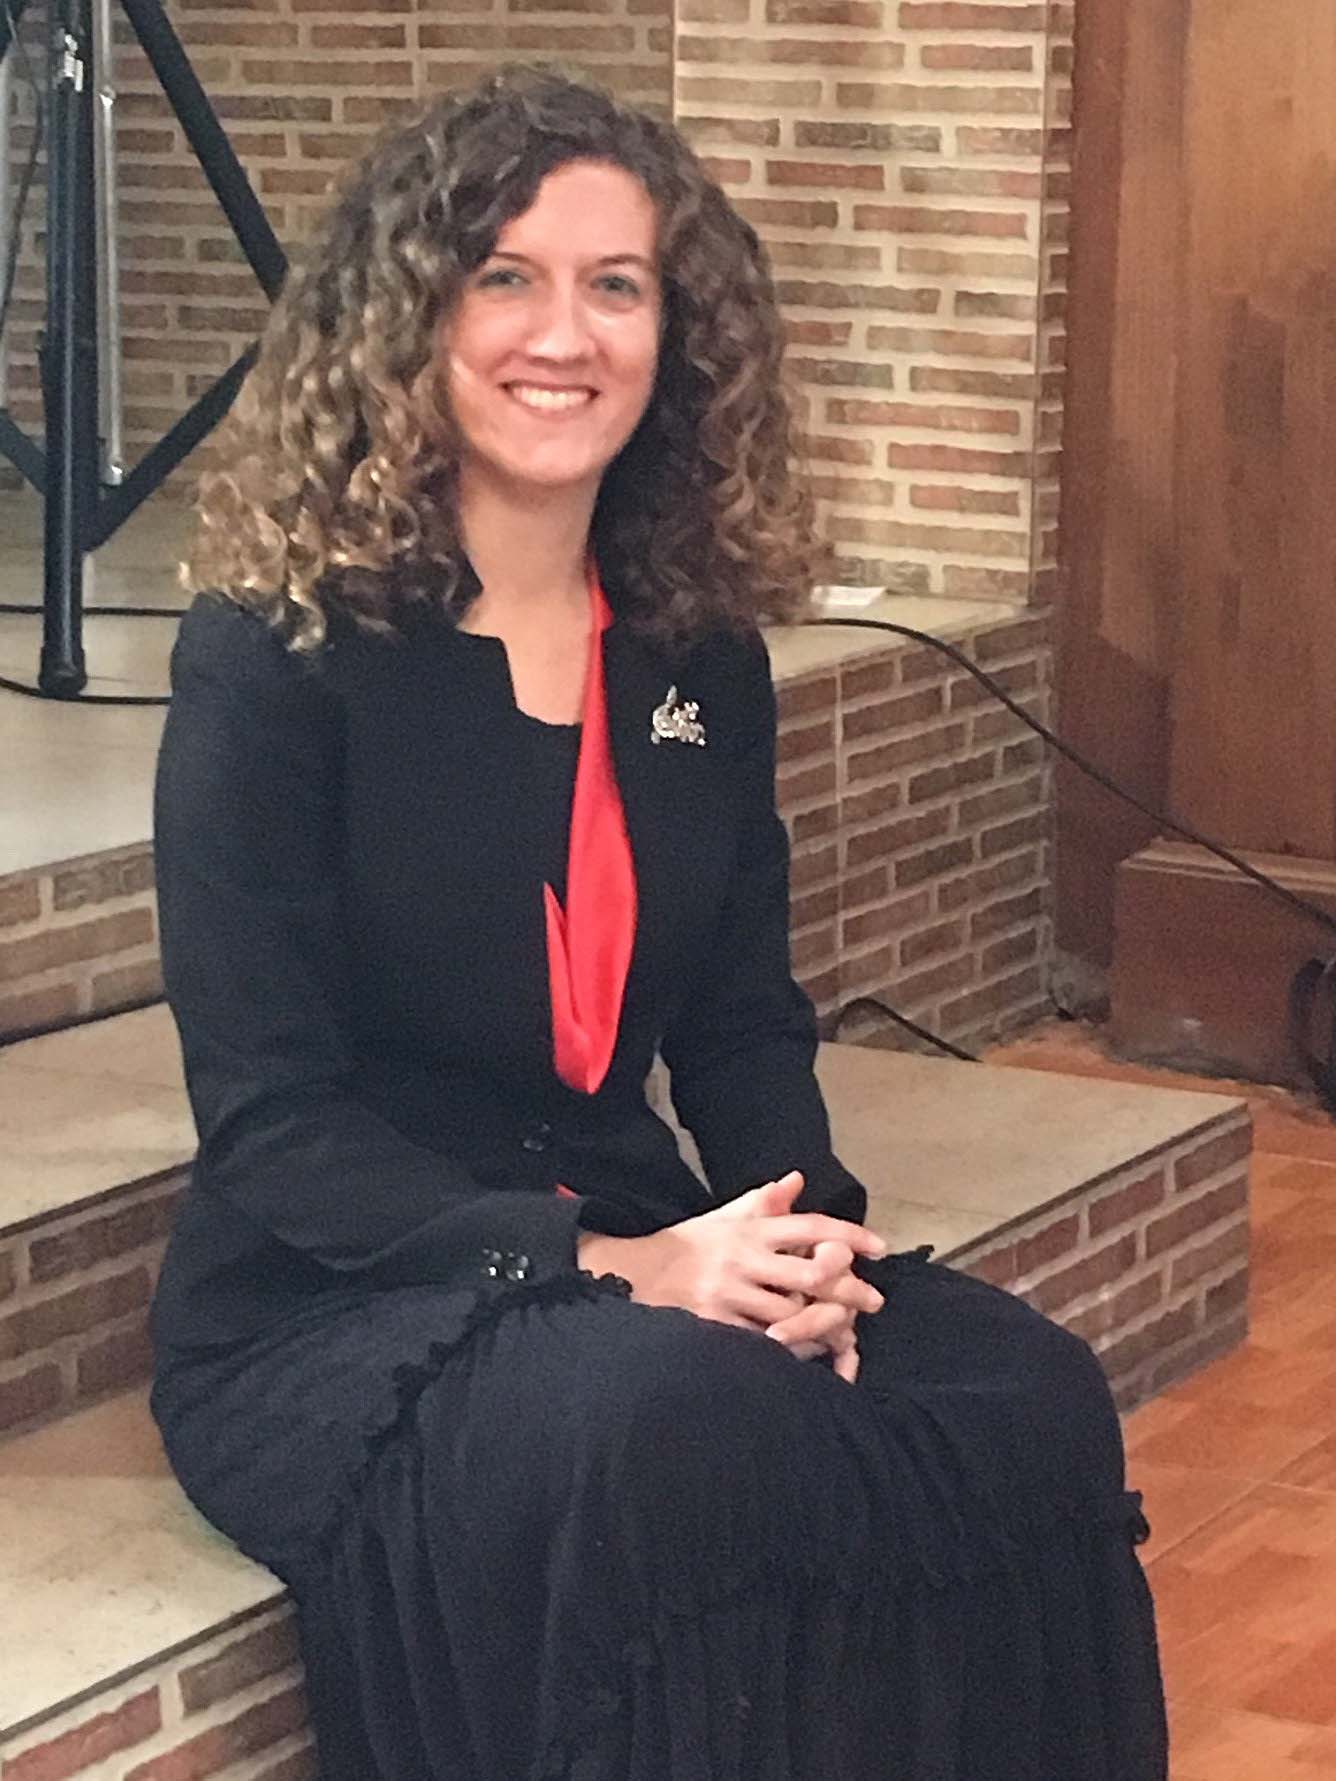 Crescendo International Choir Director Irene Oliva